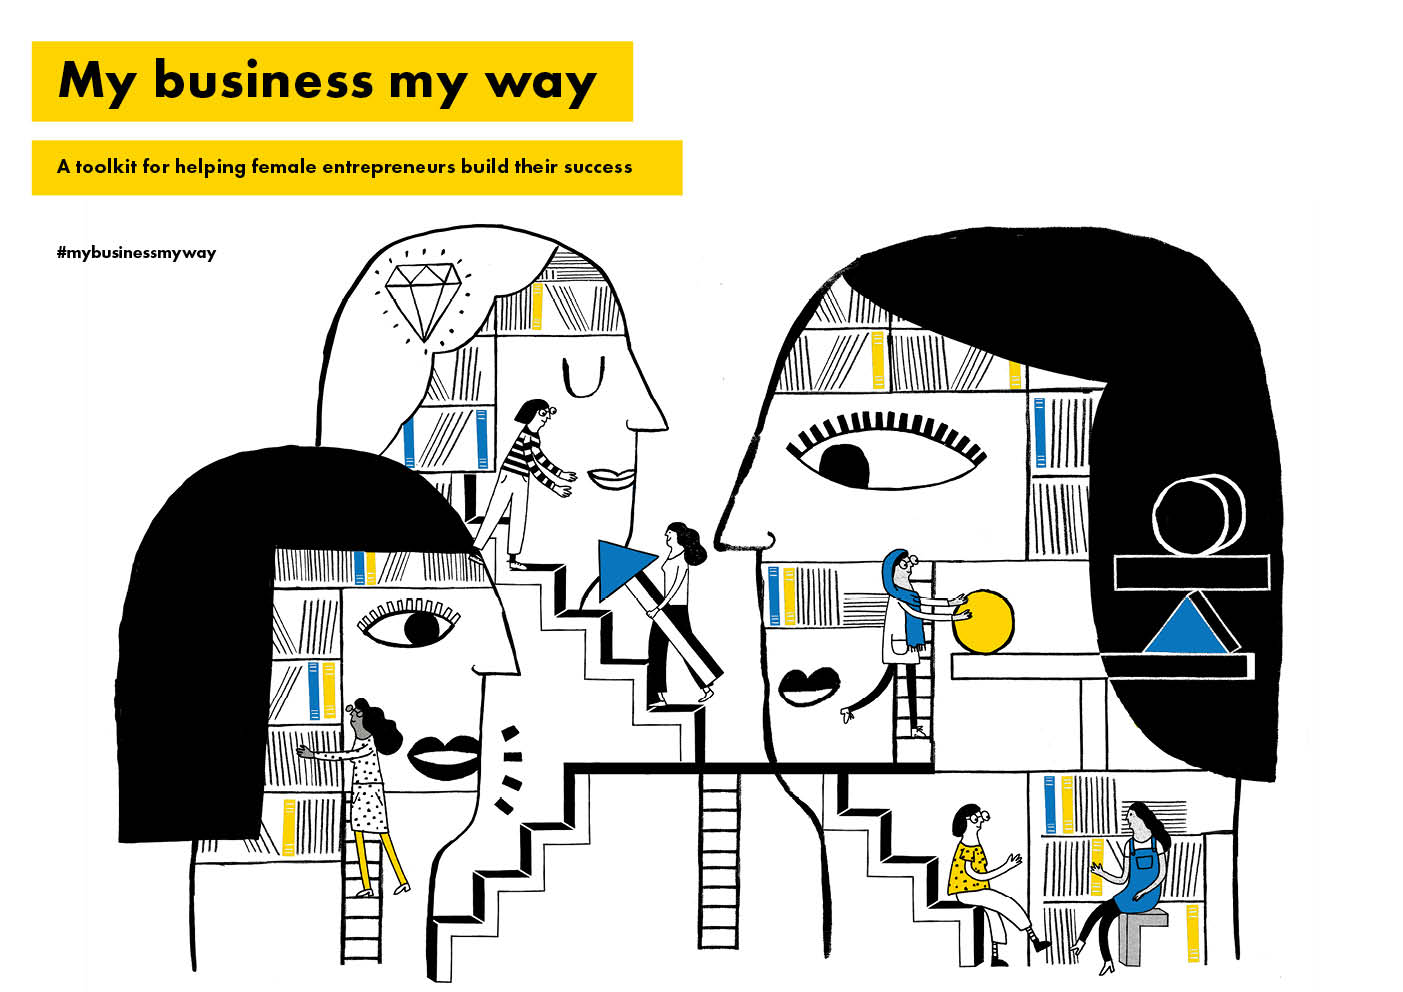 My business my way